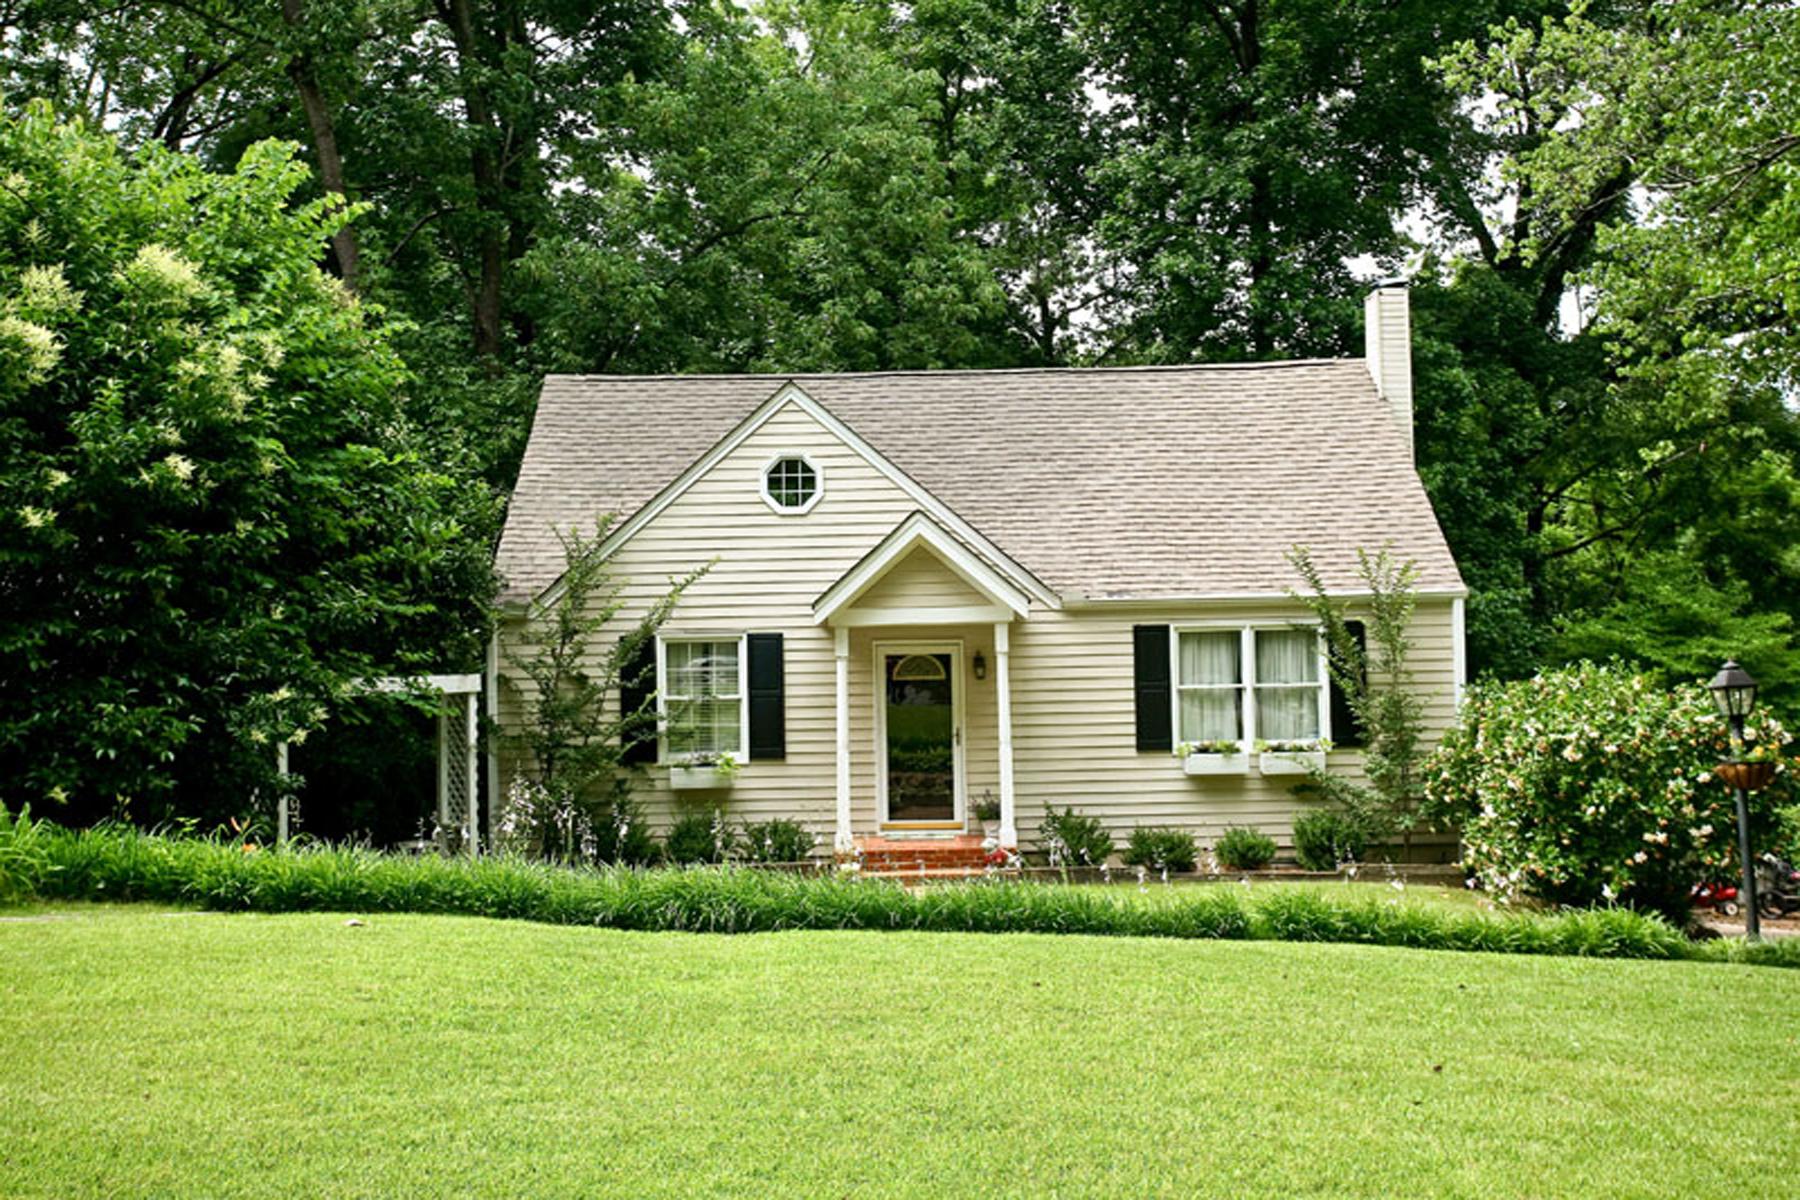 獨棟家庭住宅 為 出租 在 Charming Classic Cape Cod 3449 Hildon Circle Chamblee, 喬治亞州 30341 美國